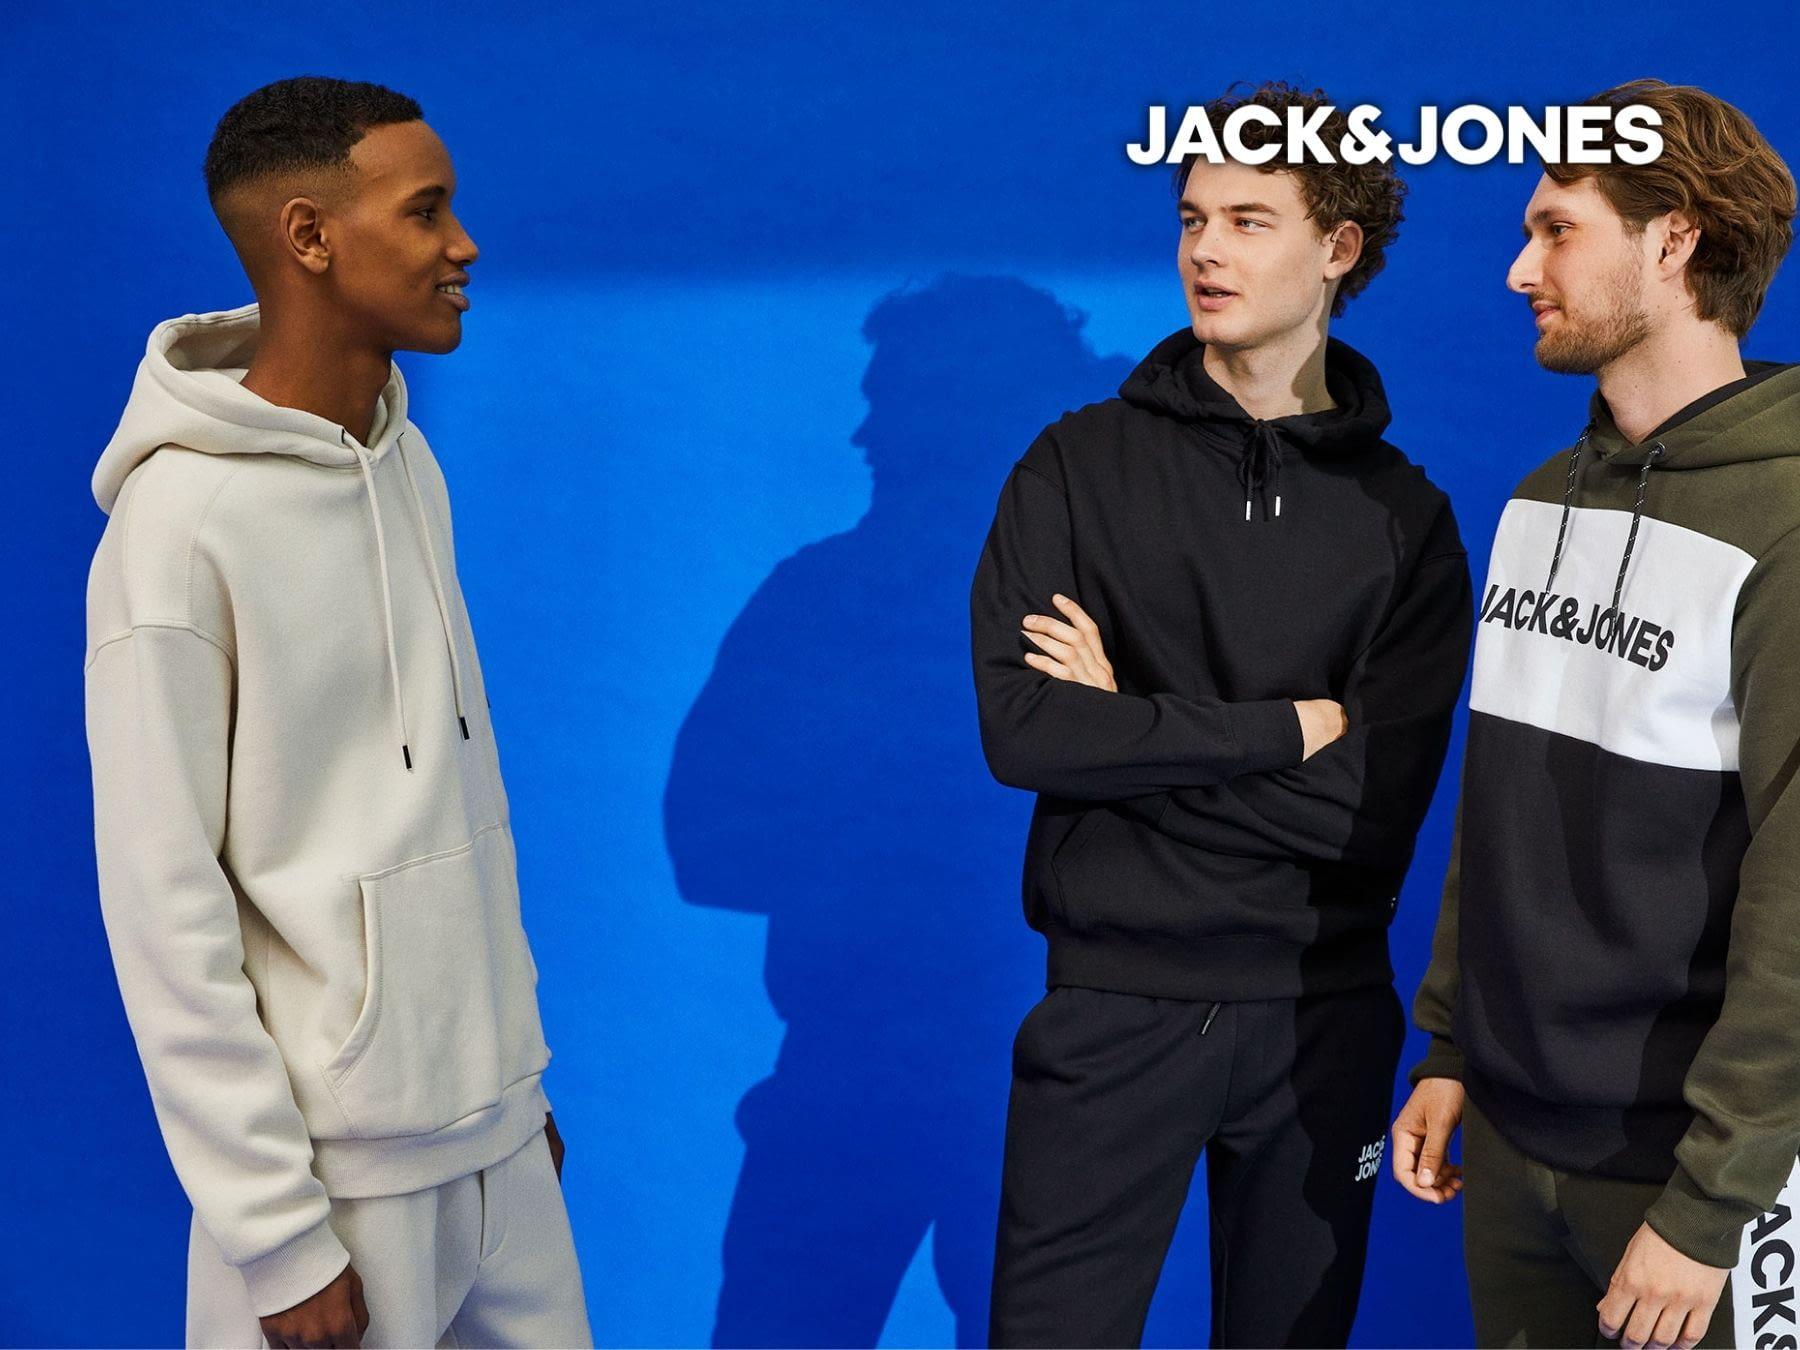 jack and jones new arrivals oi20 (1)